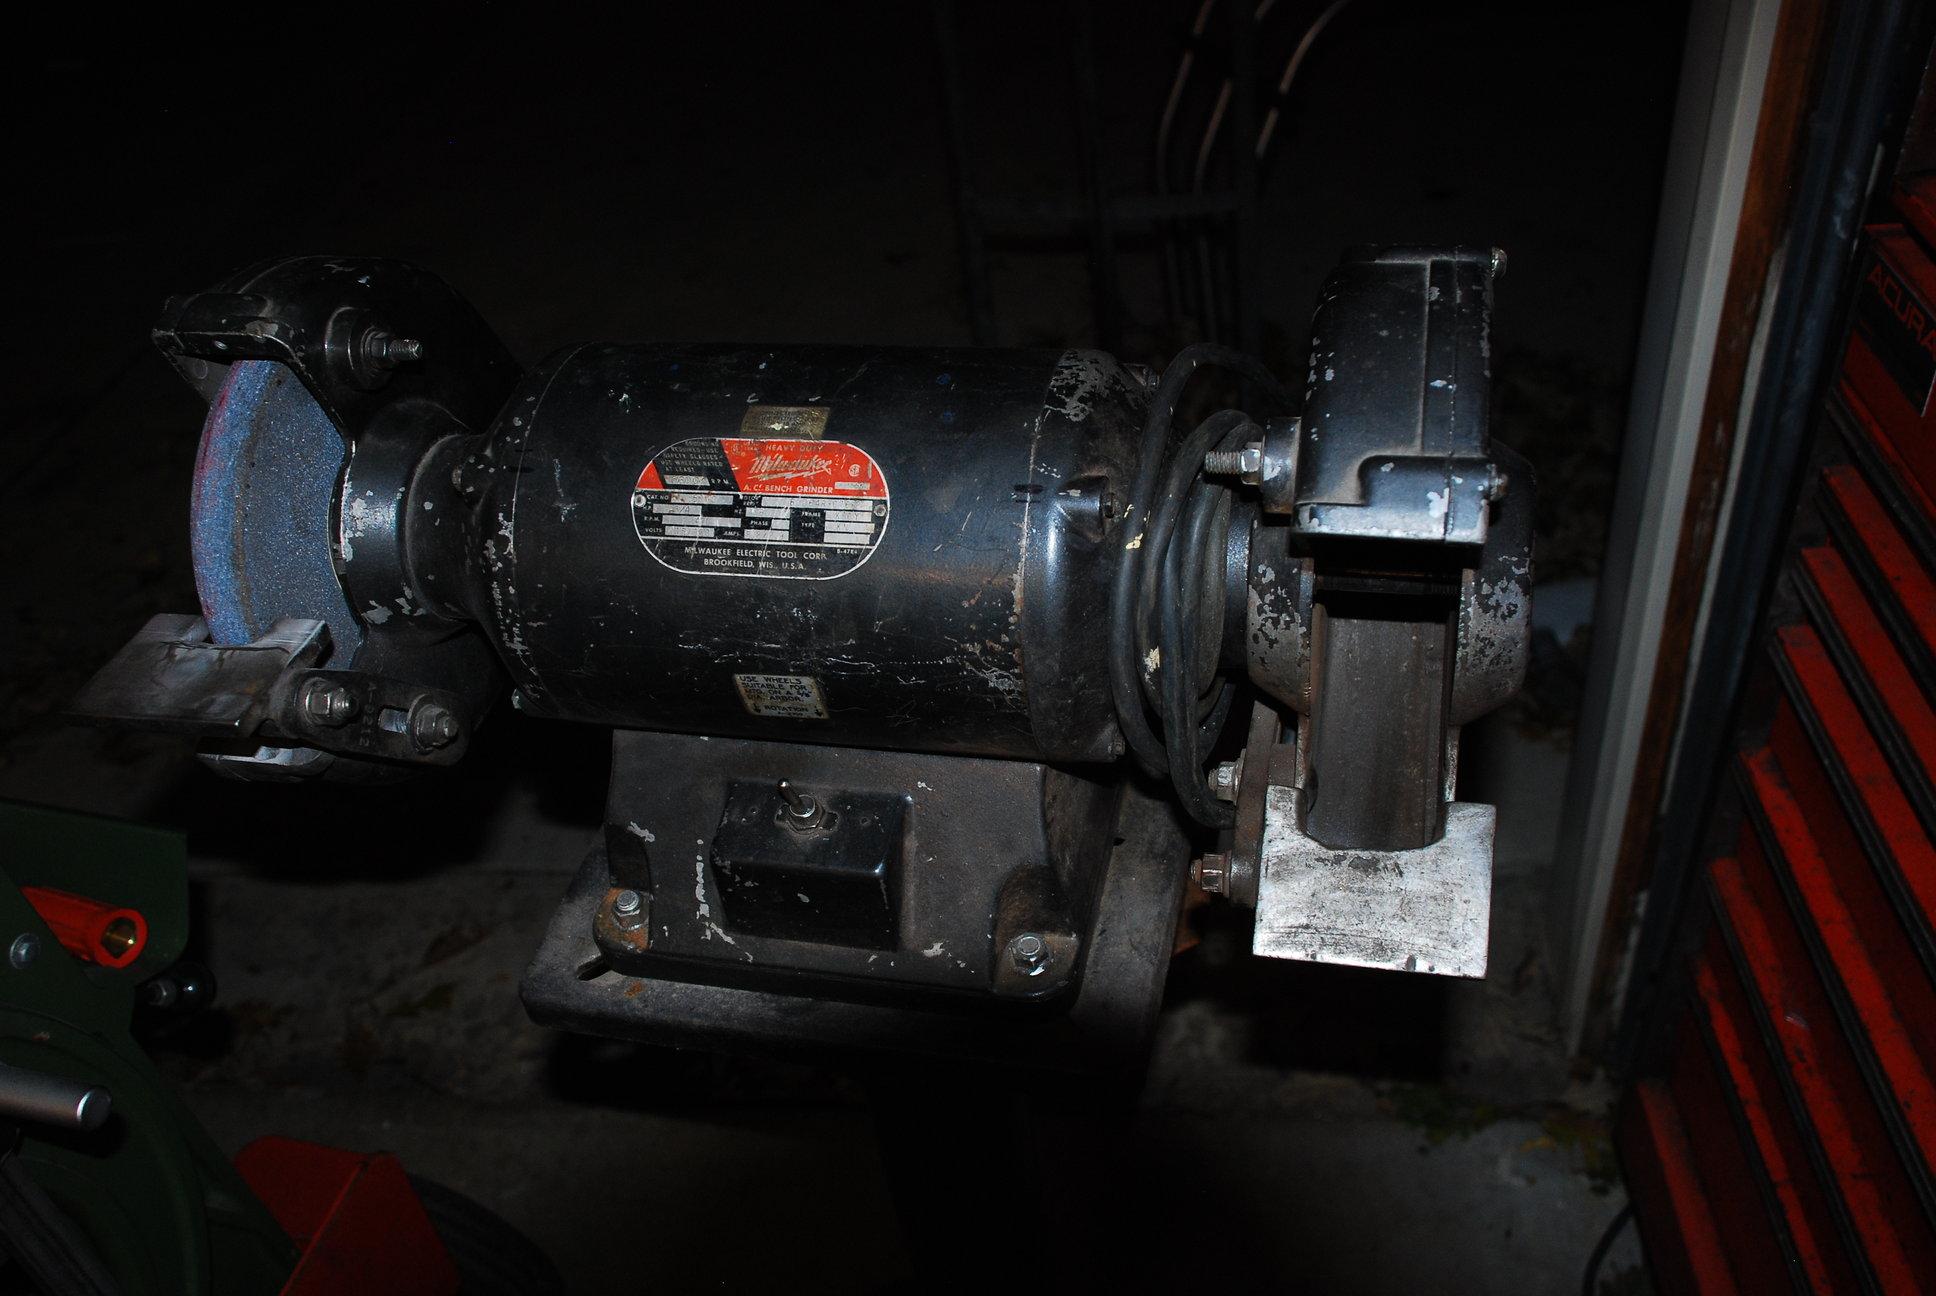 Milwaukee Bench Grinder 5645 Jpg Of Milwaukee 3 4 Hp Bench